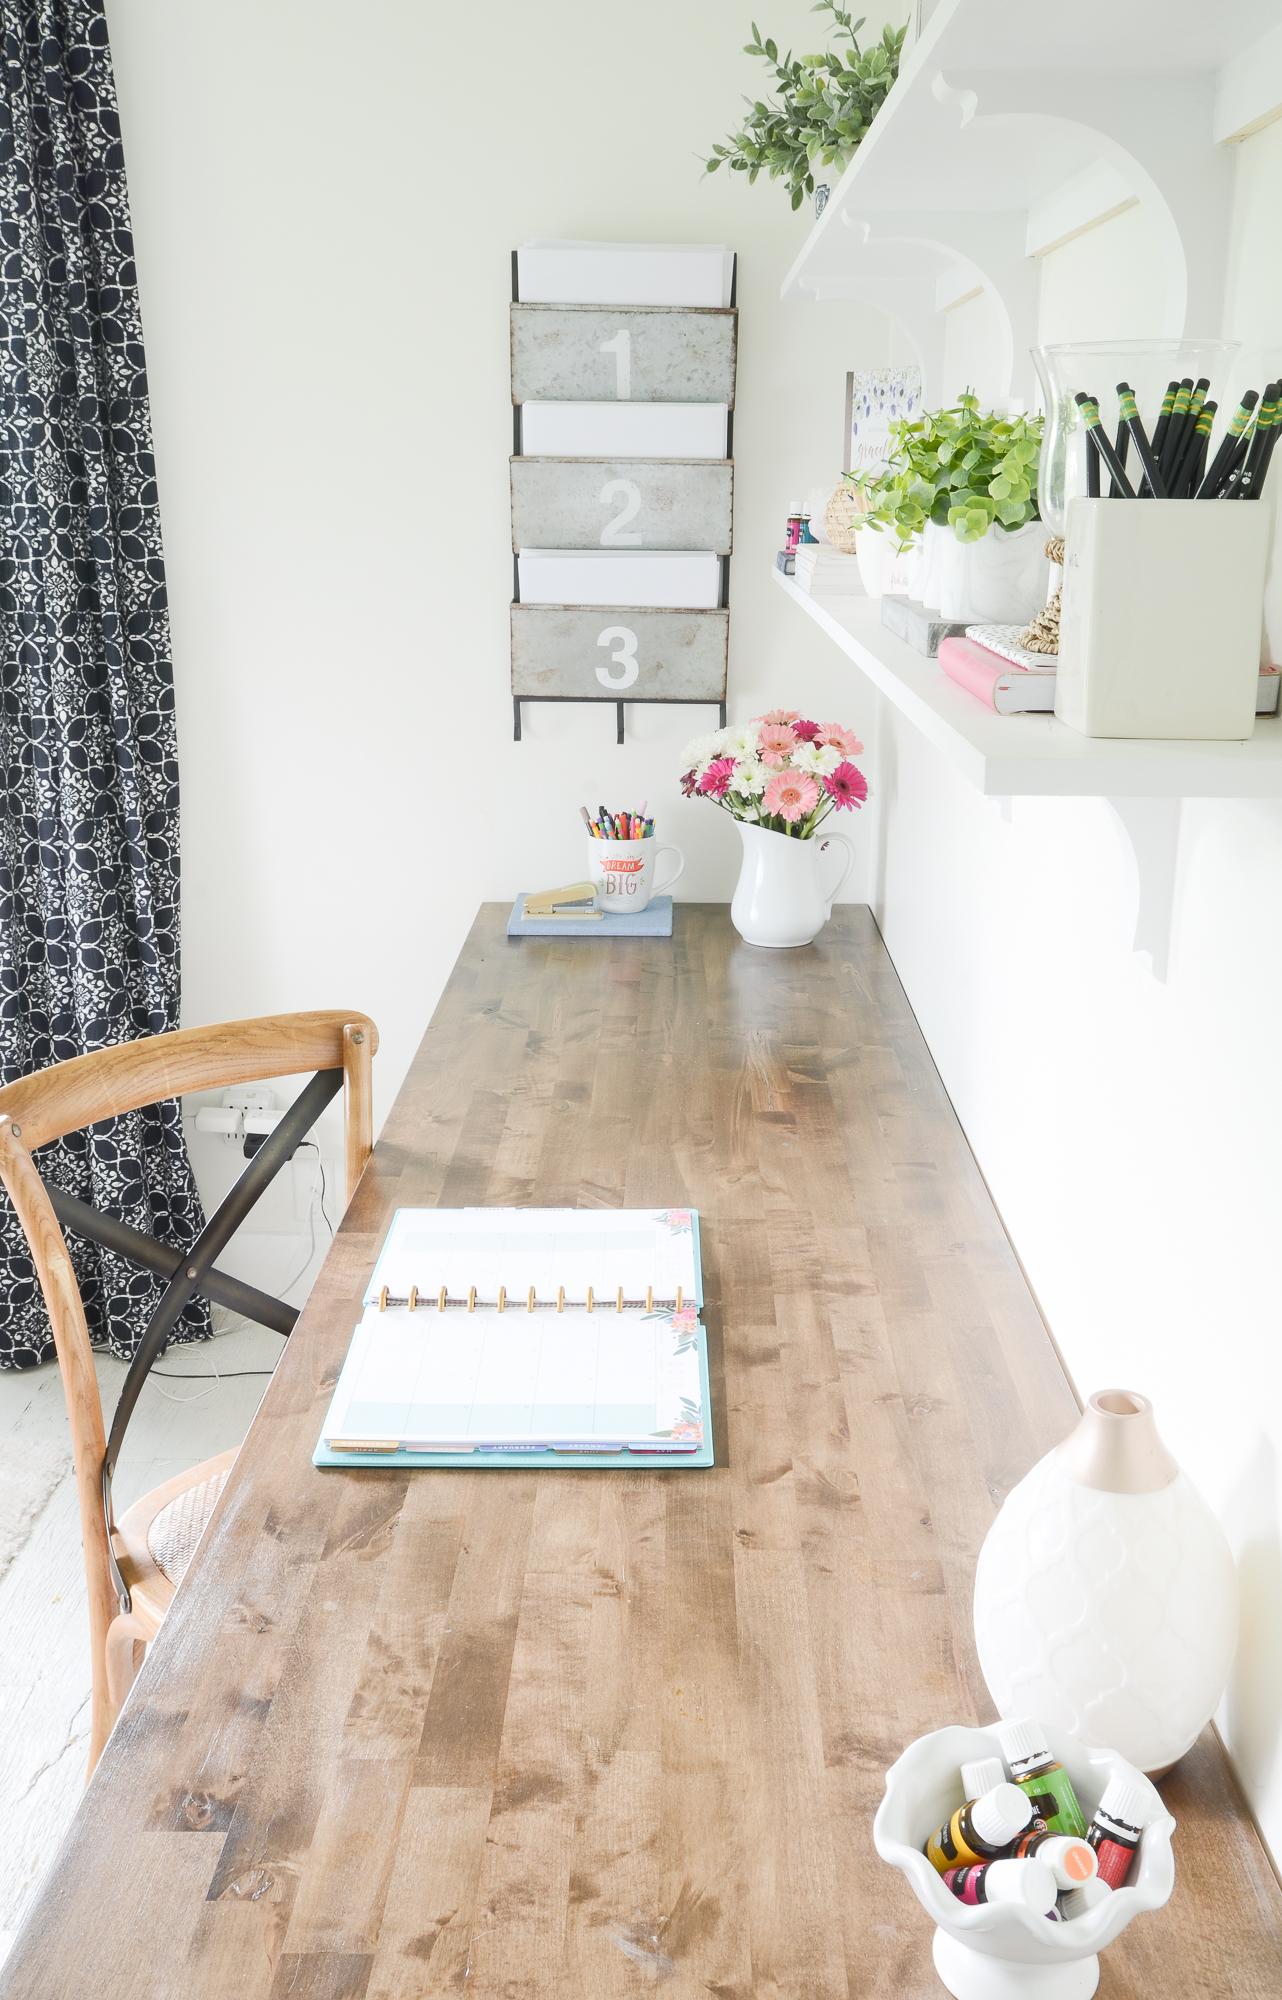 Brilliant Diy Butcher Block Desk For My Home Office Beneath My Heart Download Free Architecture Designs Embacsunscenecom